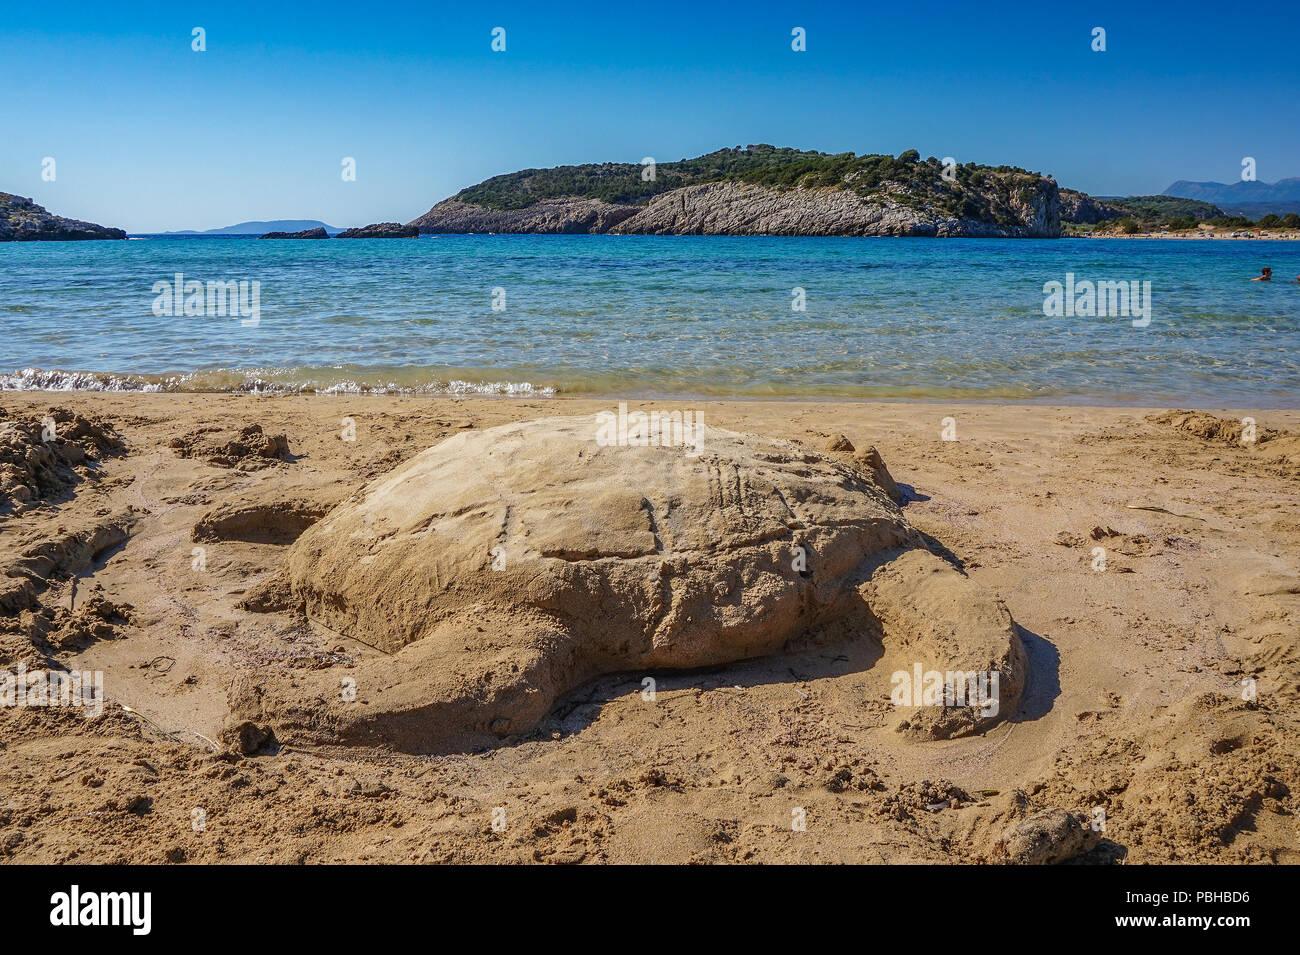 Amazing sea turtle on the beach hand made of sand in Voidokilia, Messenia, Greece - Stock Image